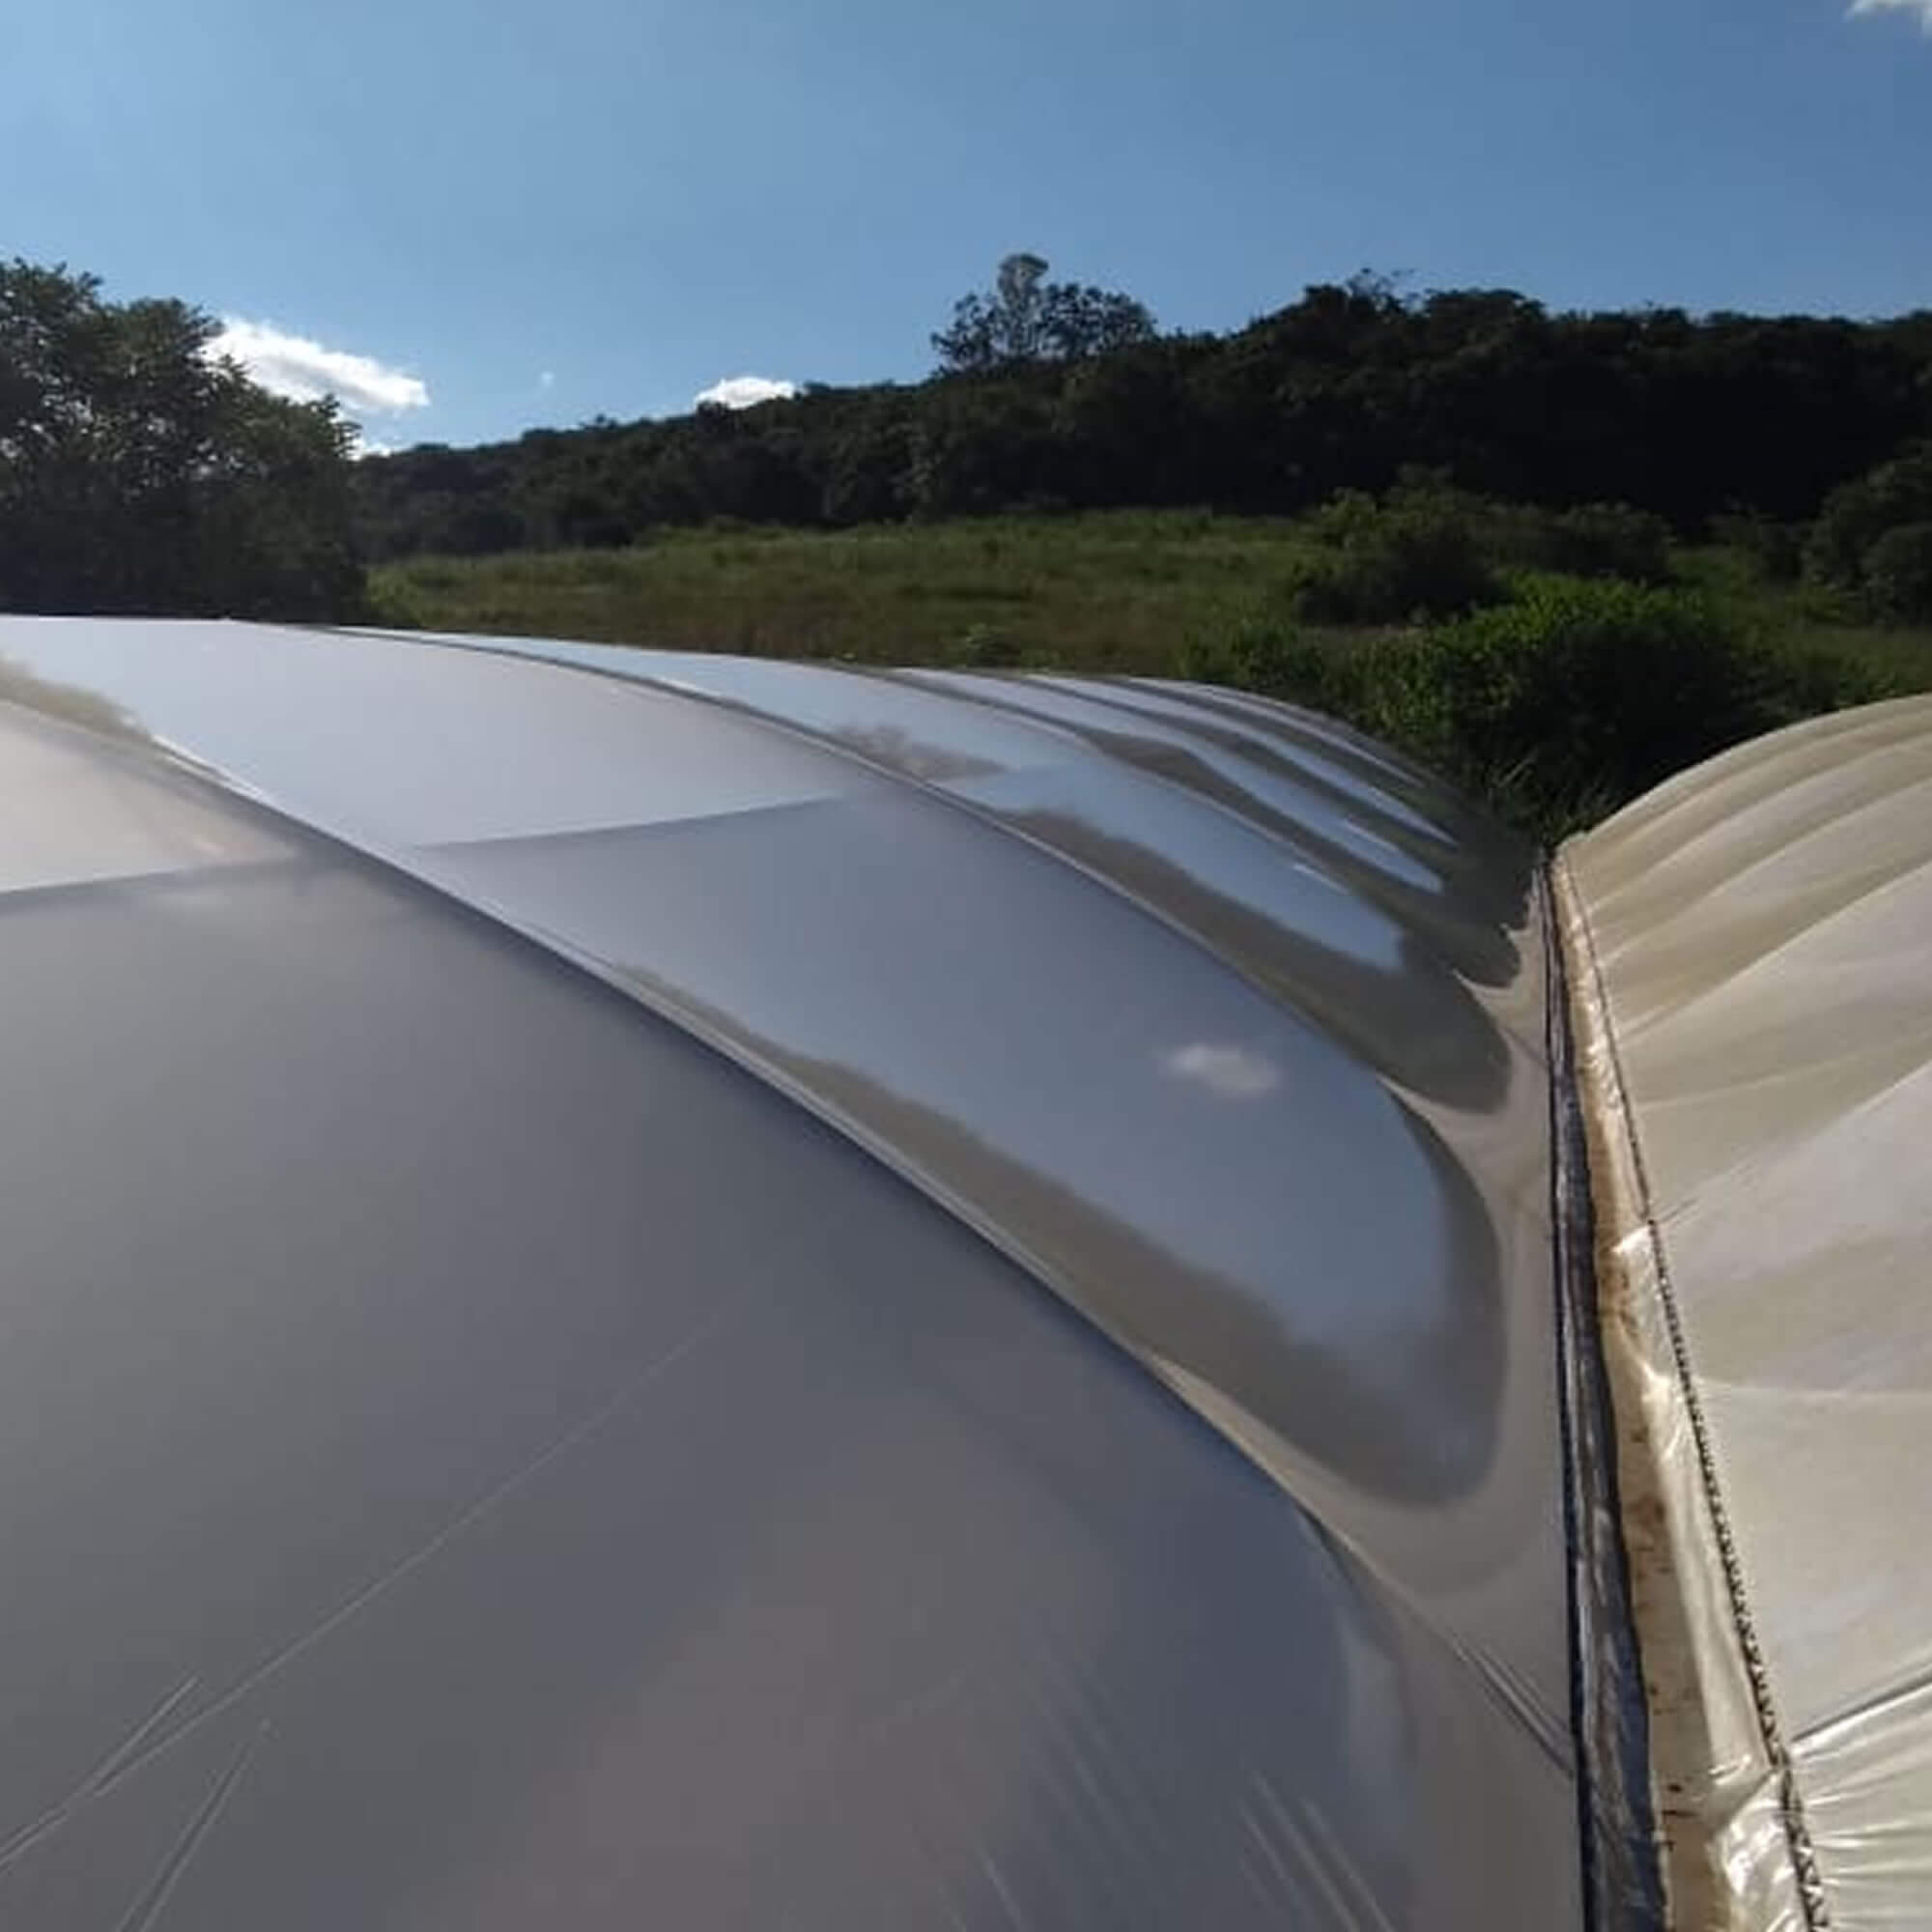 Filme Plástico Difusor para Estufa - 4x55 metros - 90 micras - Politiv